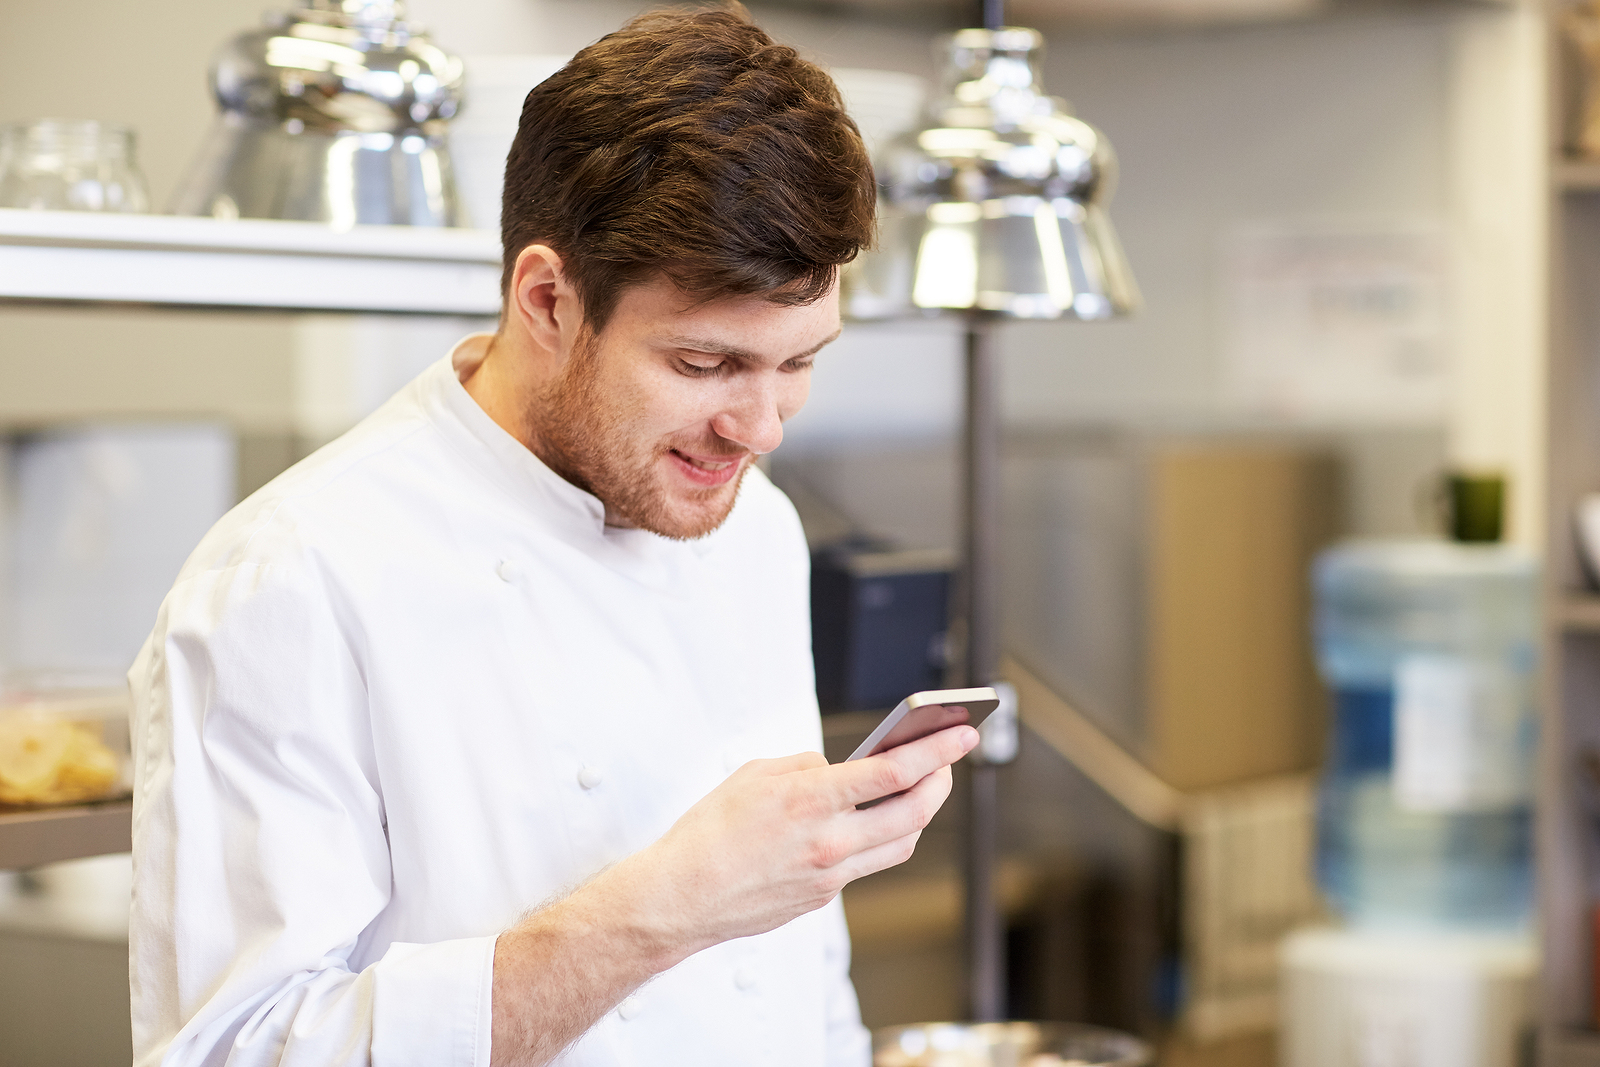 chef looking at restaurant repair and maintenance app